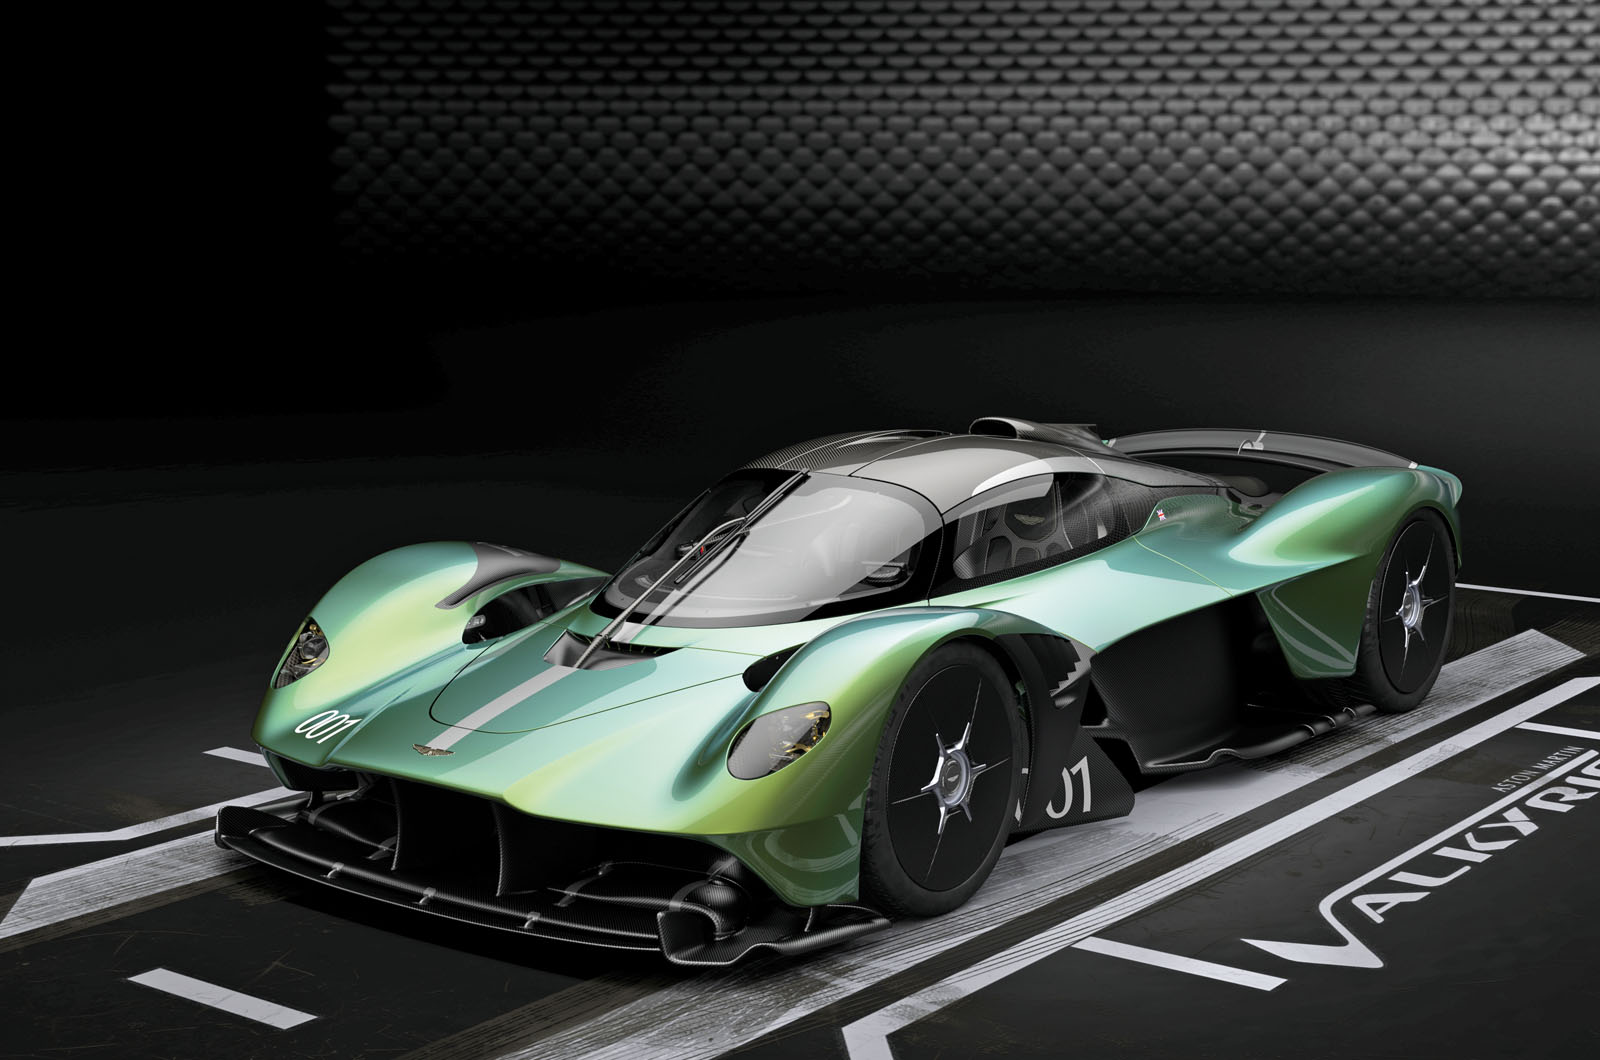 New Aston Martin Valkyrie Gets Track Focused Bodywork Option Autocar